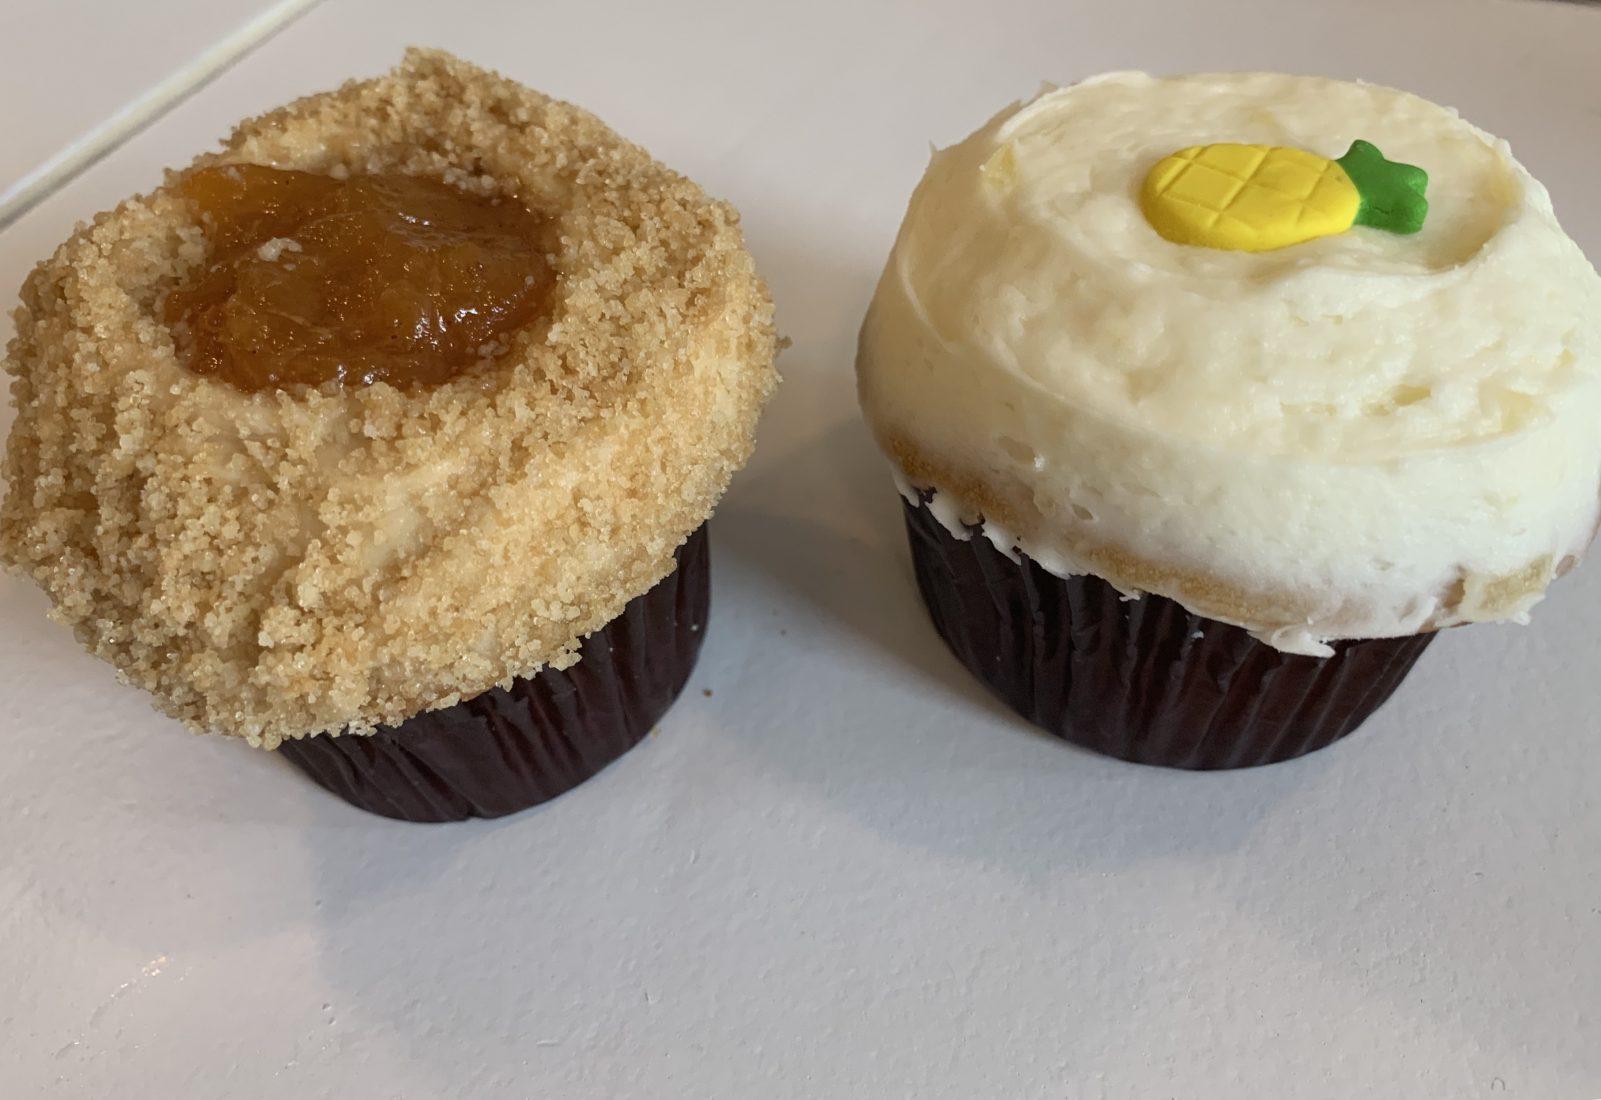 Sprinkles Cupcake's New Summer Flavors